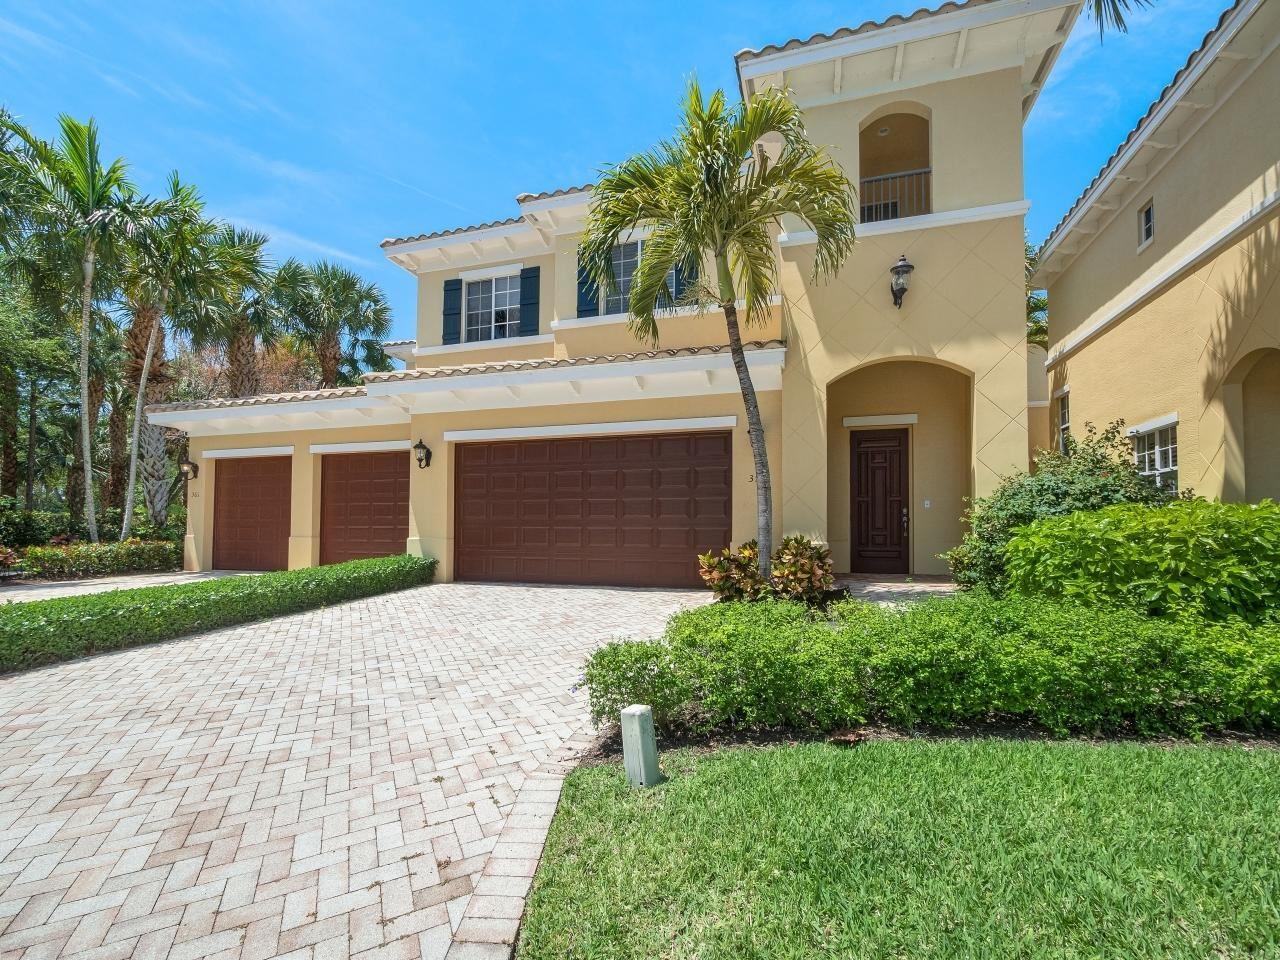 359 Chambord Terrace, Palm Beach Gardens, FL 33410 - MLS#: RX-10708464